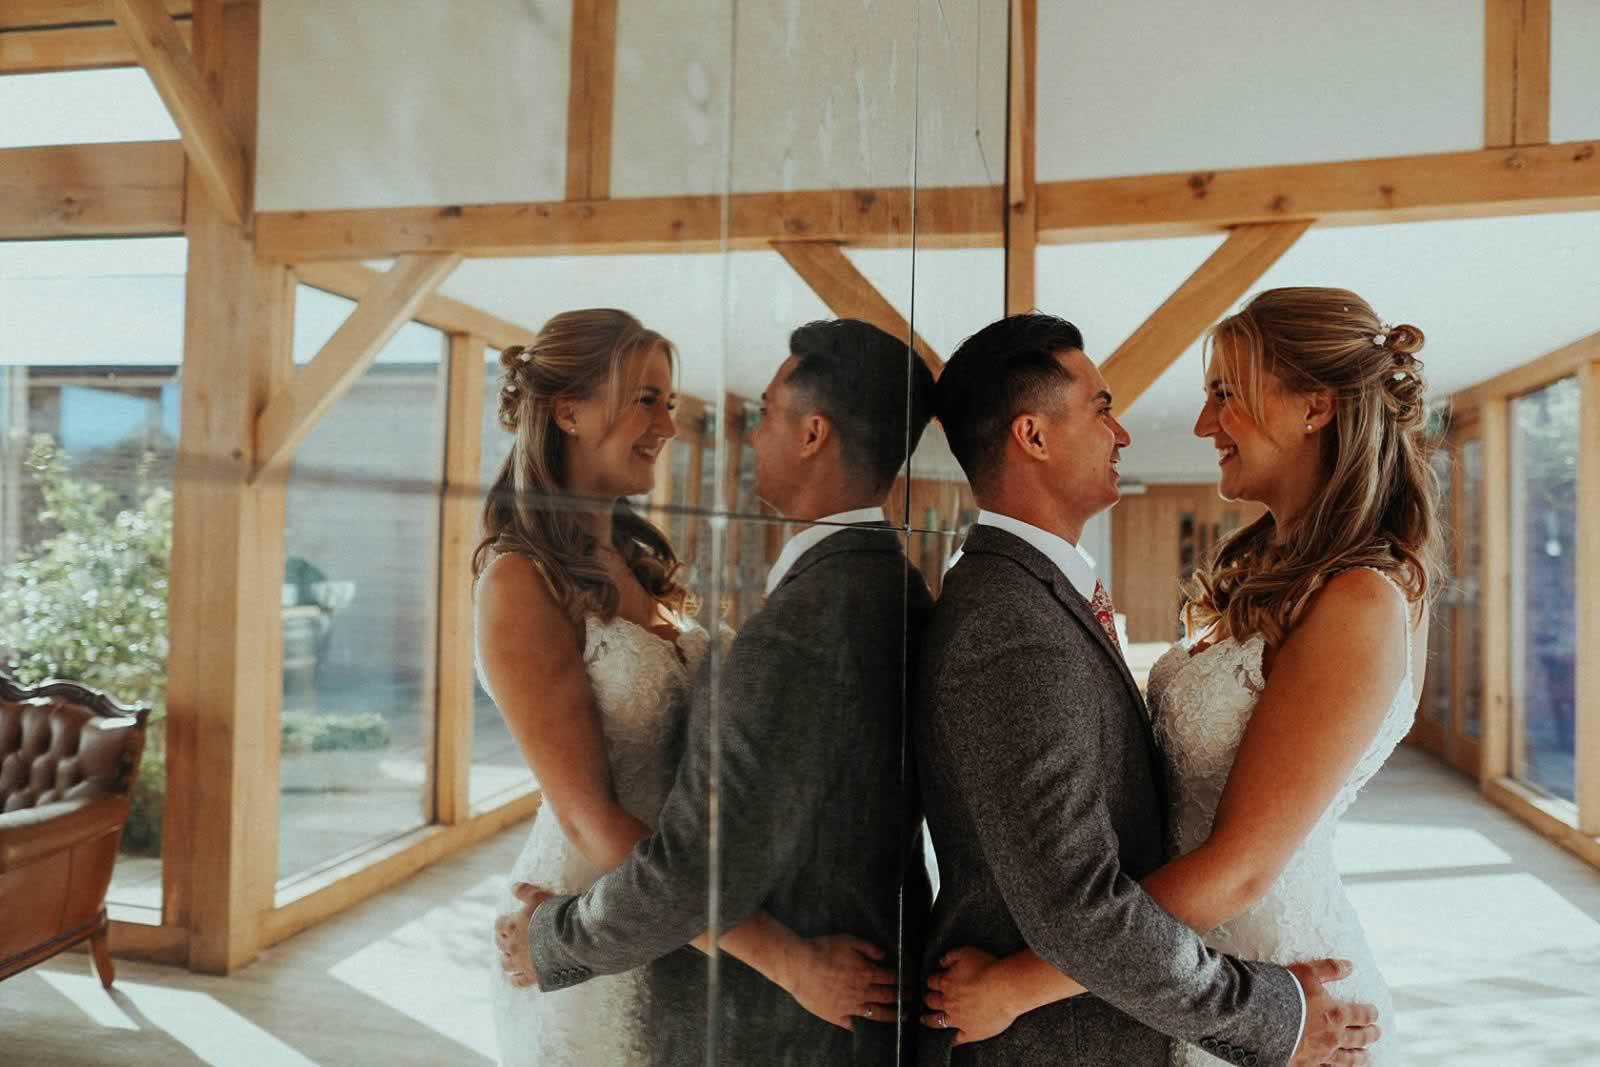 Pryors-Hayes-Wedding-Photography-Barn-Venue-Cheshire-embee-photography-0171.jpg